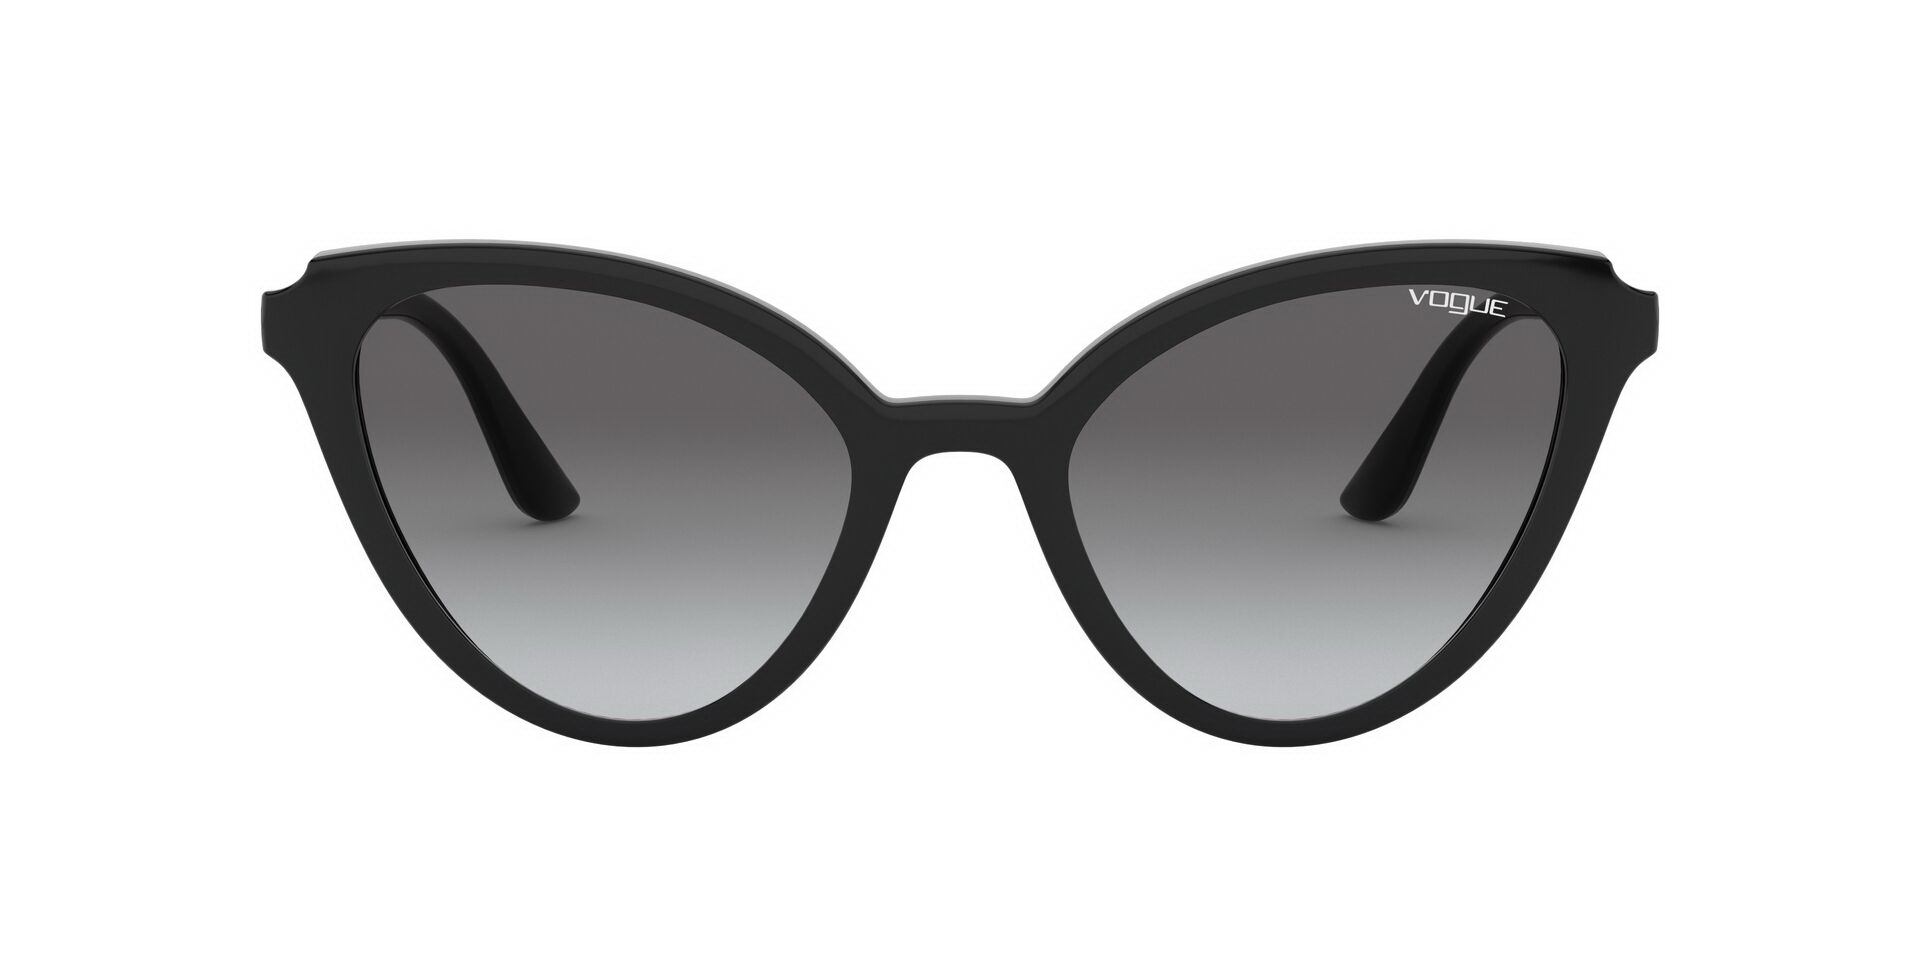 Солнцезащитные очки Очки с/з VOGUE 0VO5294S W44/11 фото